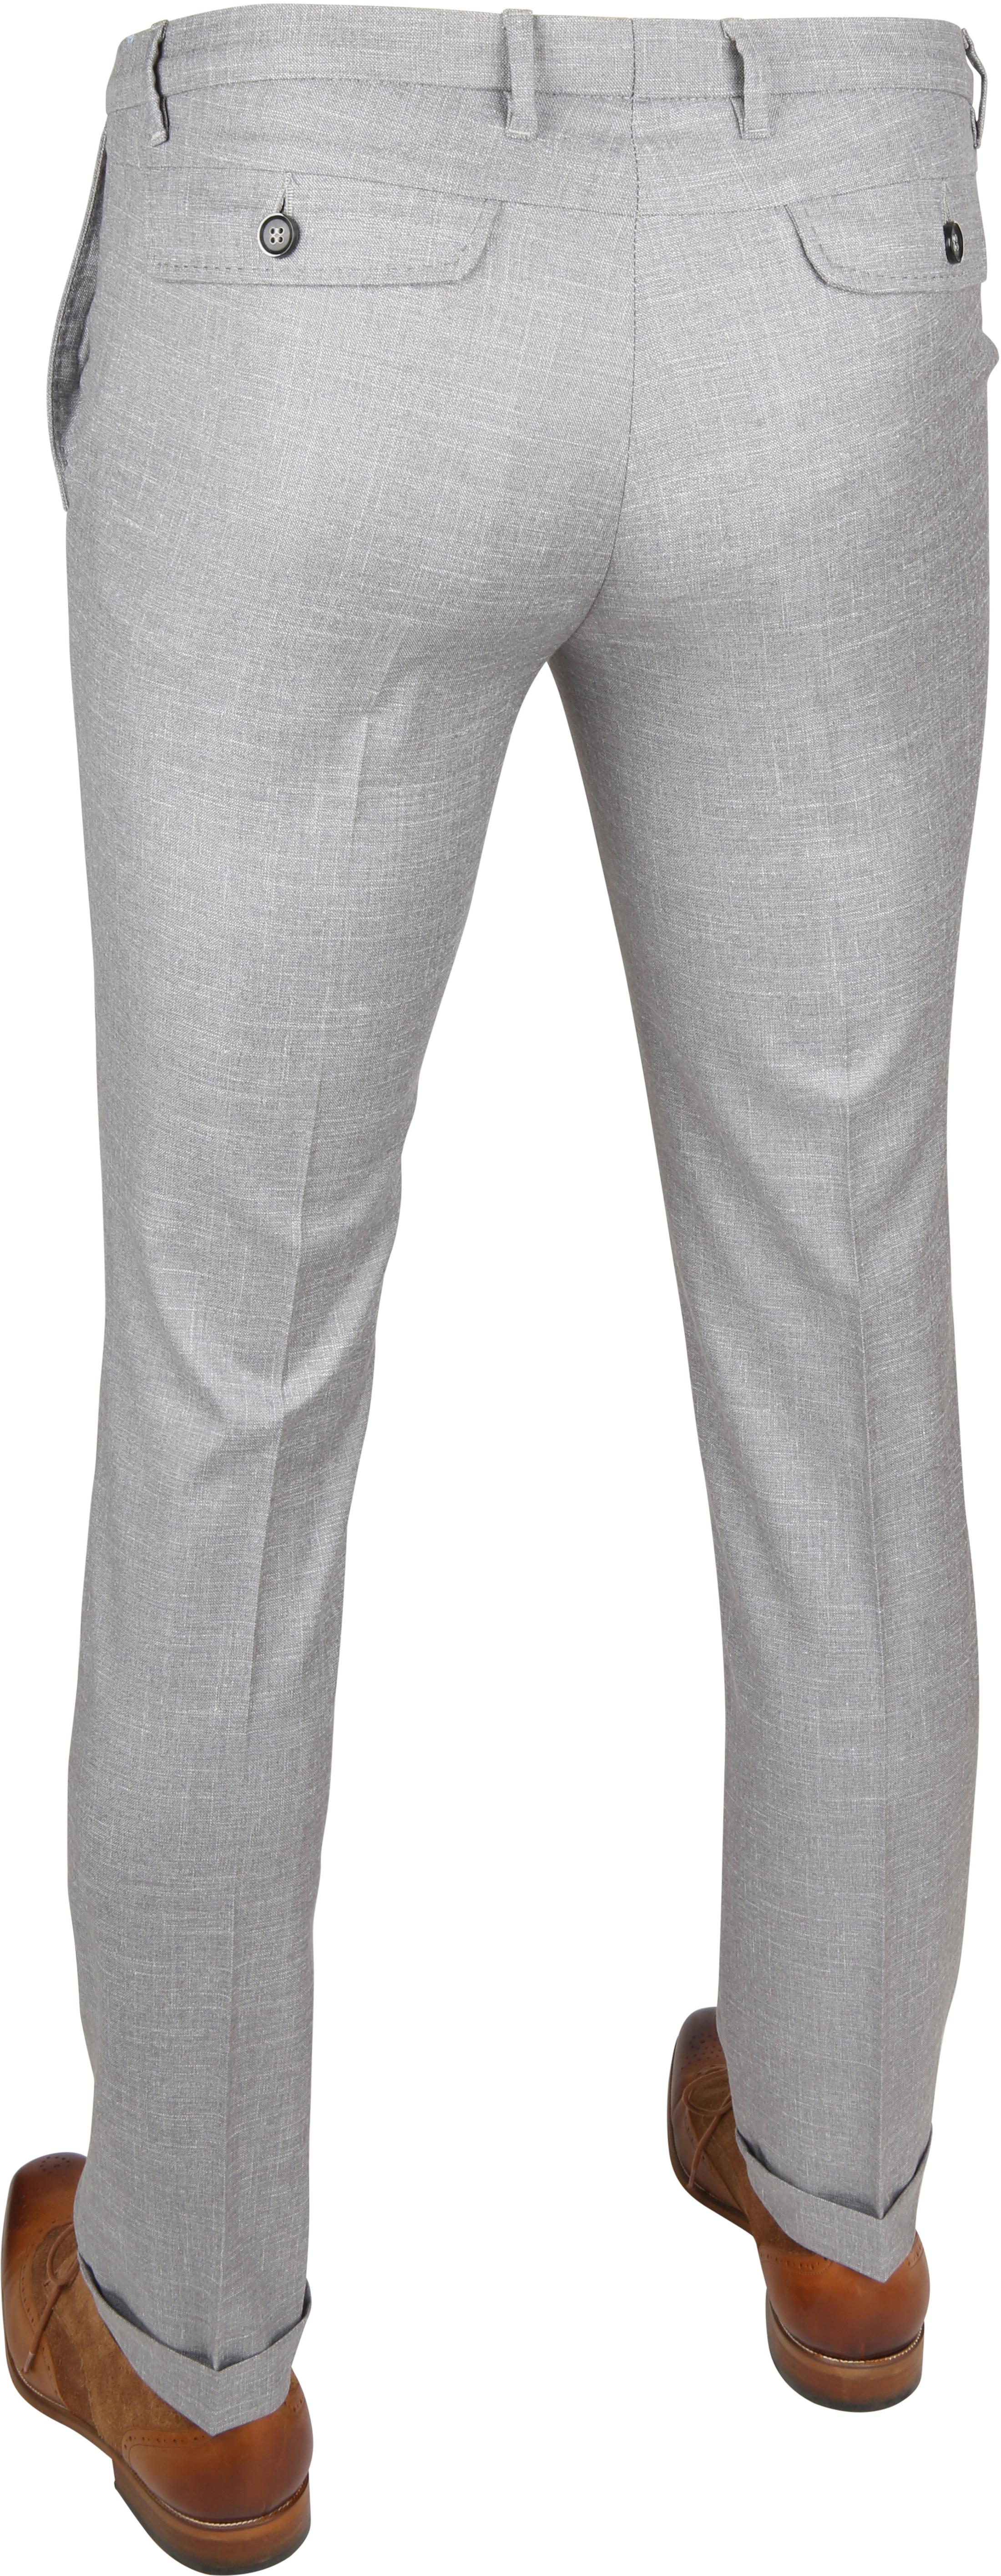 Suitable Pantalon Pisa Melange Grau foto 3